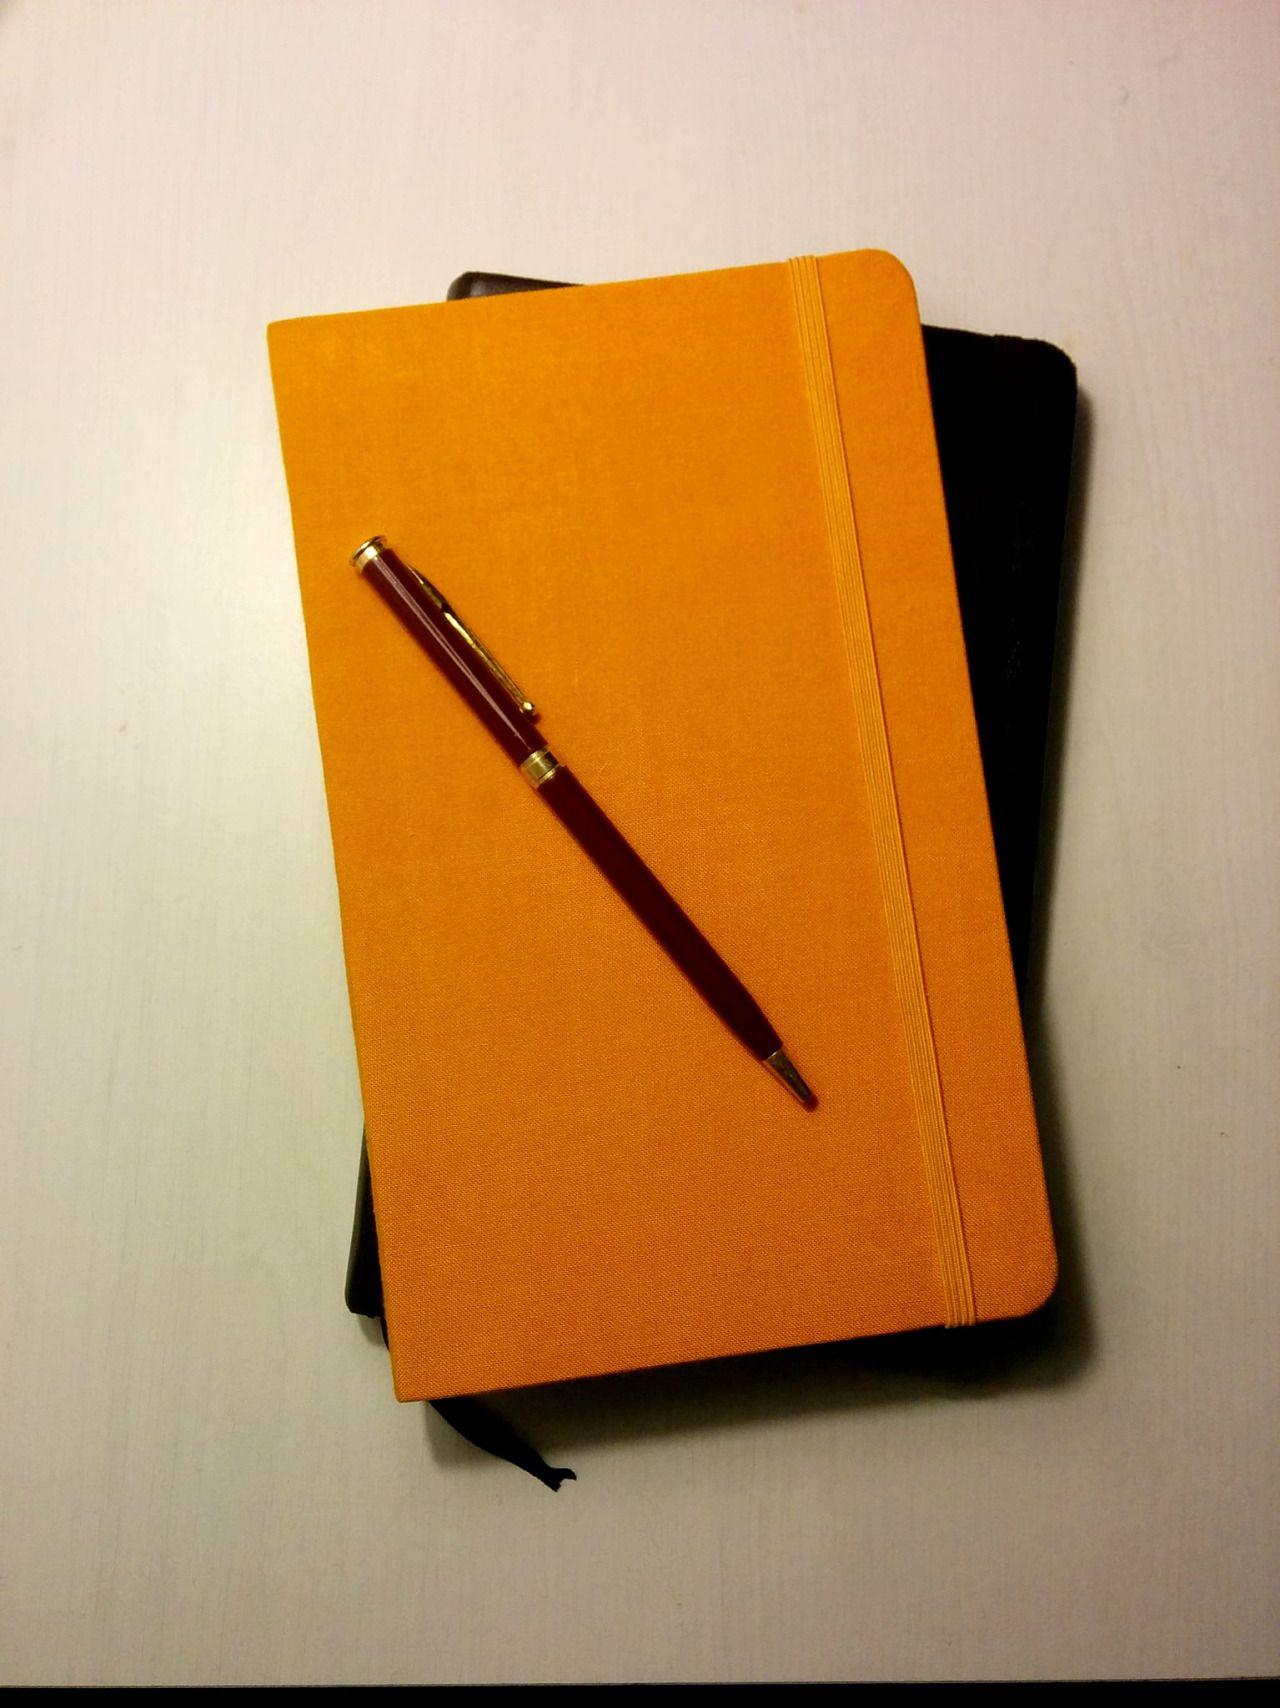 New notebooks by soulfulpoignant